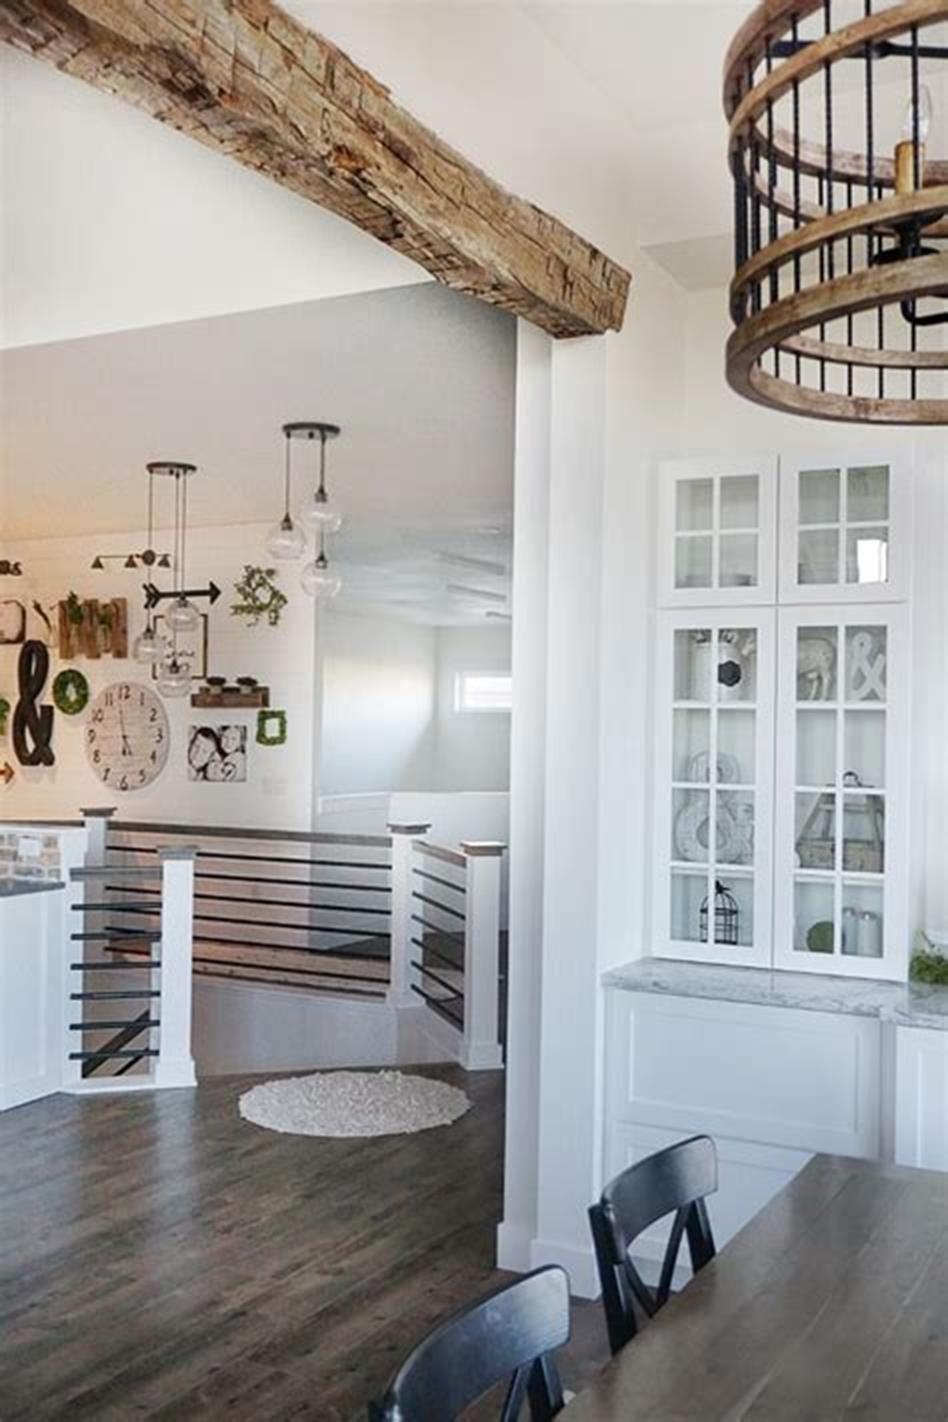 31 Amazing Modern Farmhouse Interior Design Ideas | Modern ...